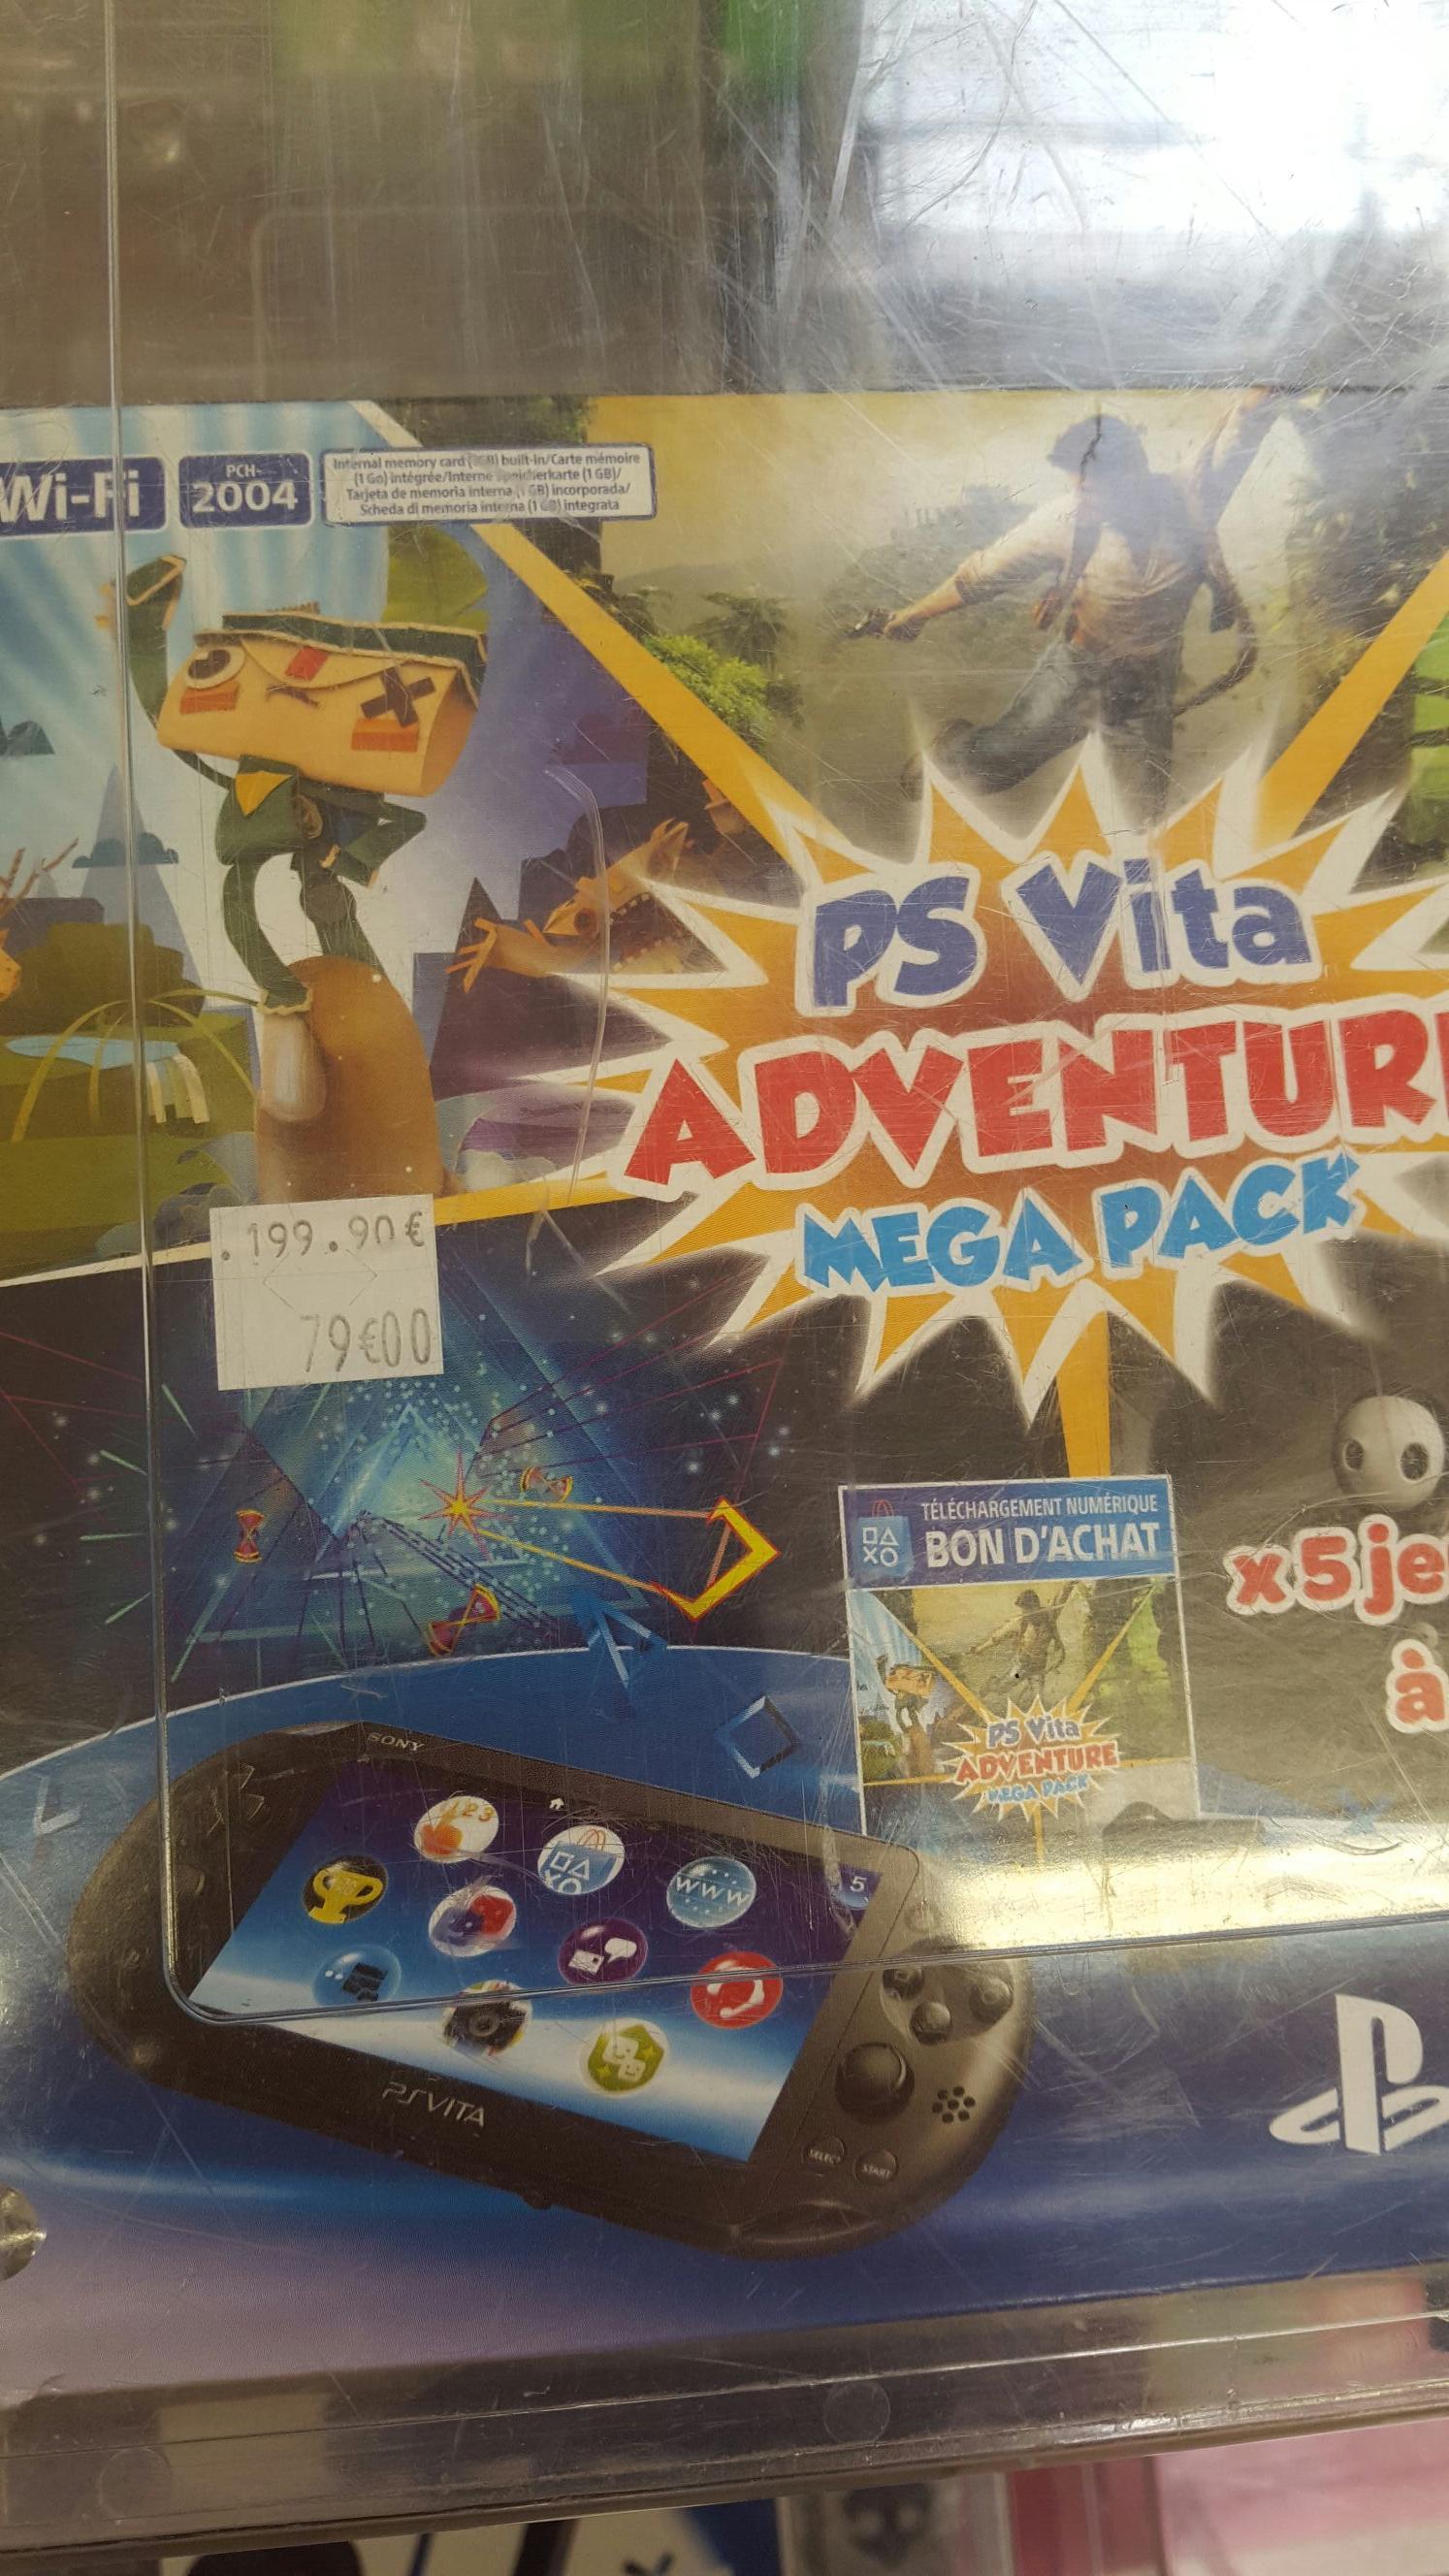 Console Sony PS Vita + Adventure Méga Pack + Carte mémoire 8 Go